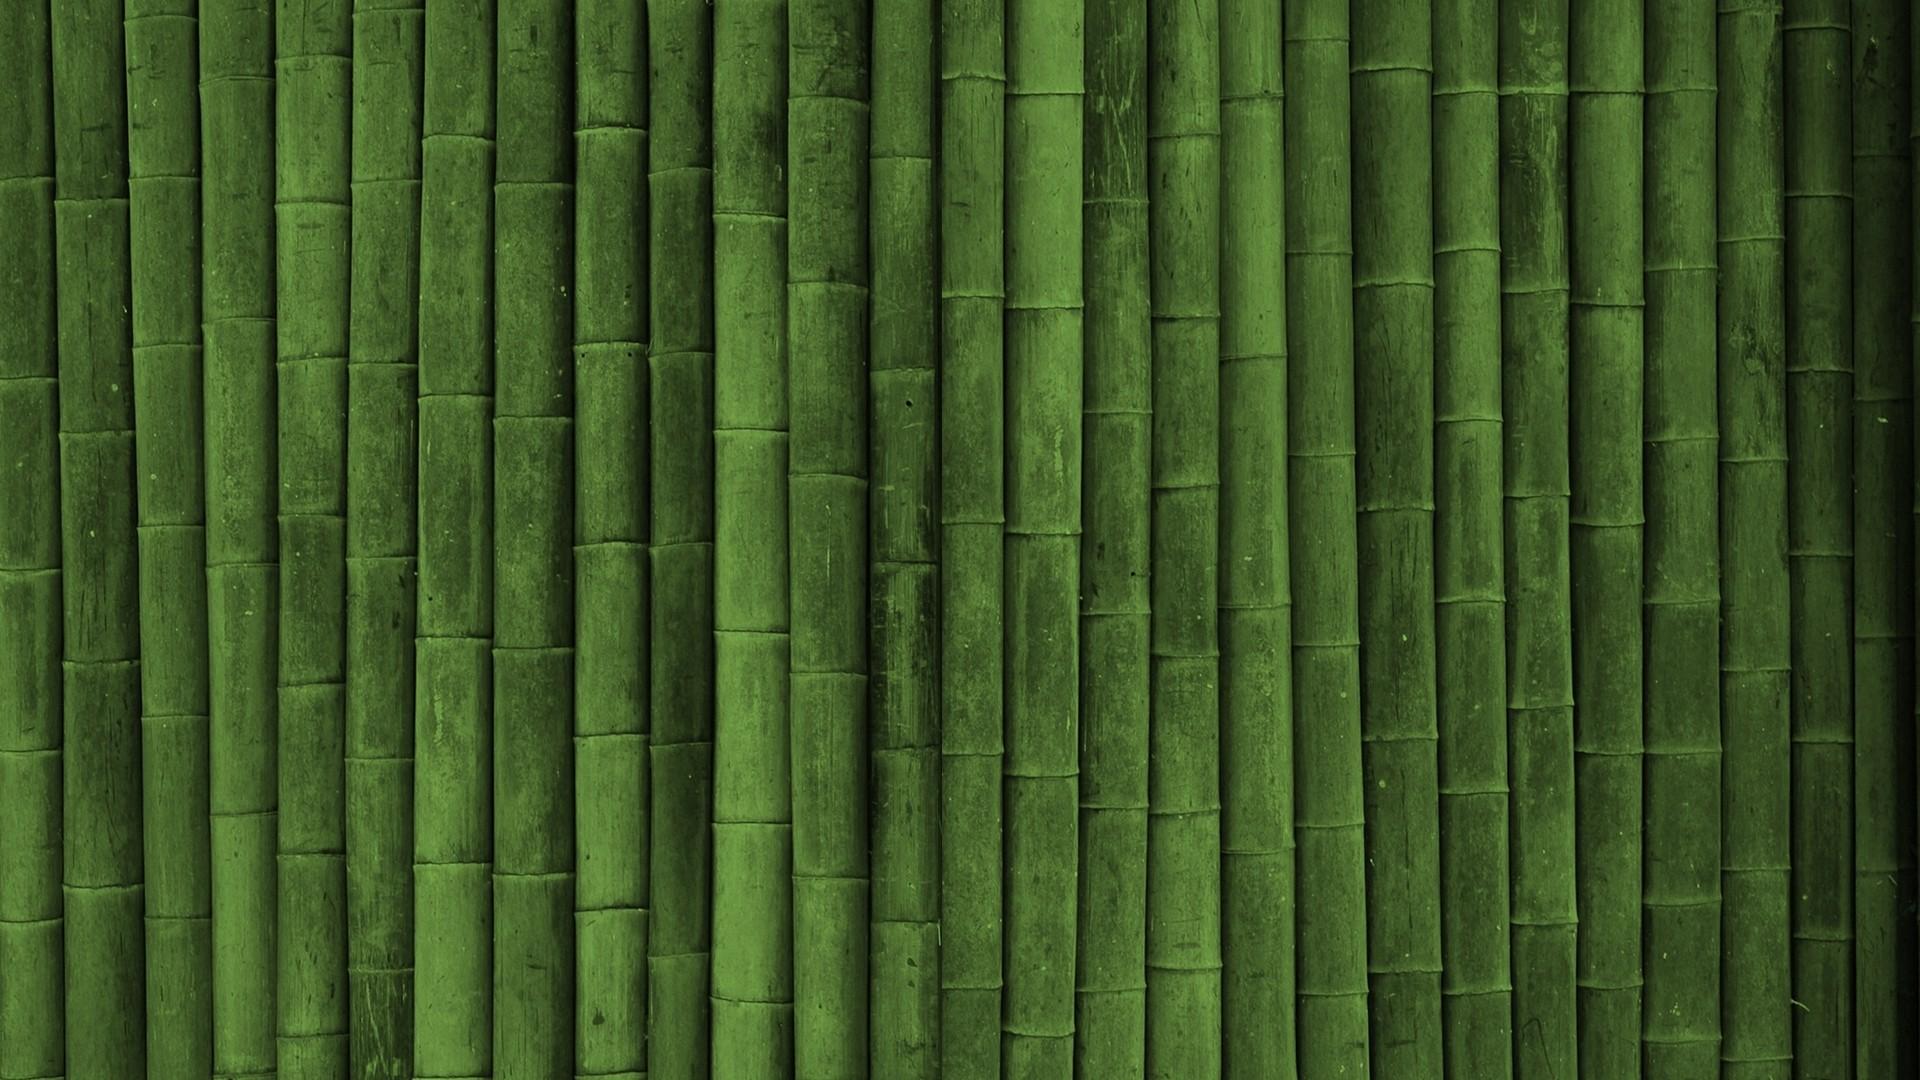 bamboo pics